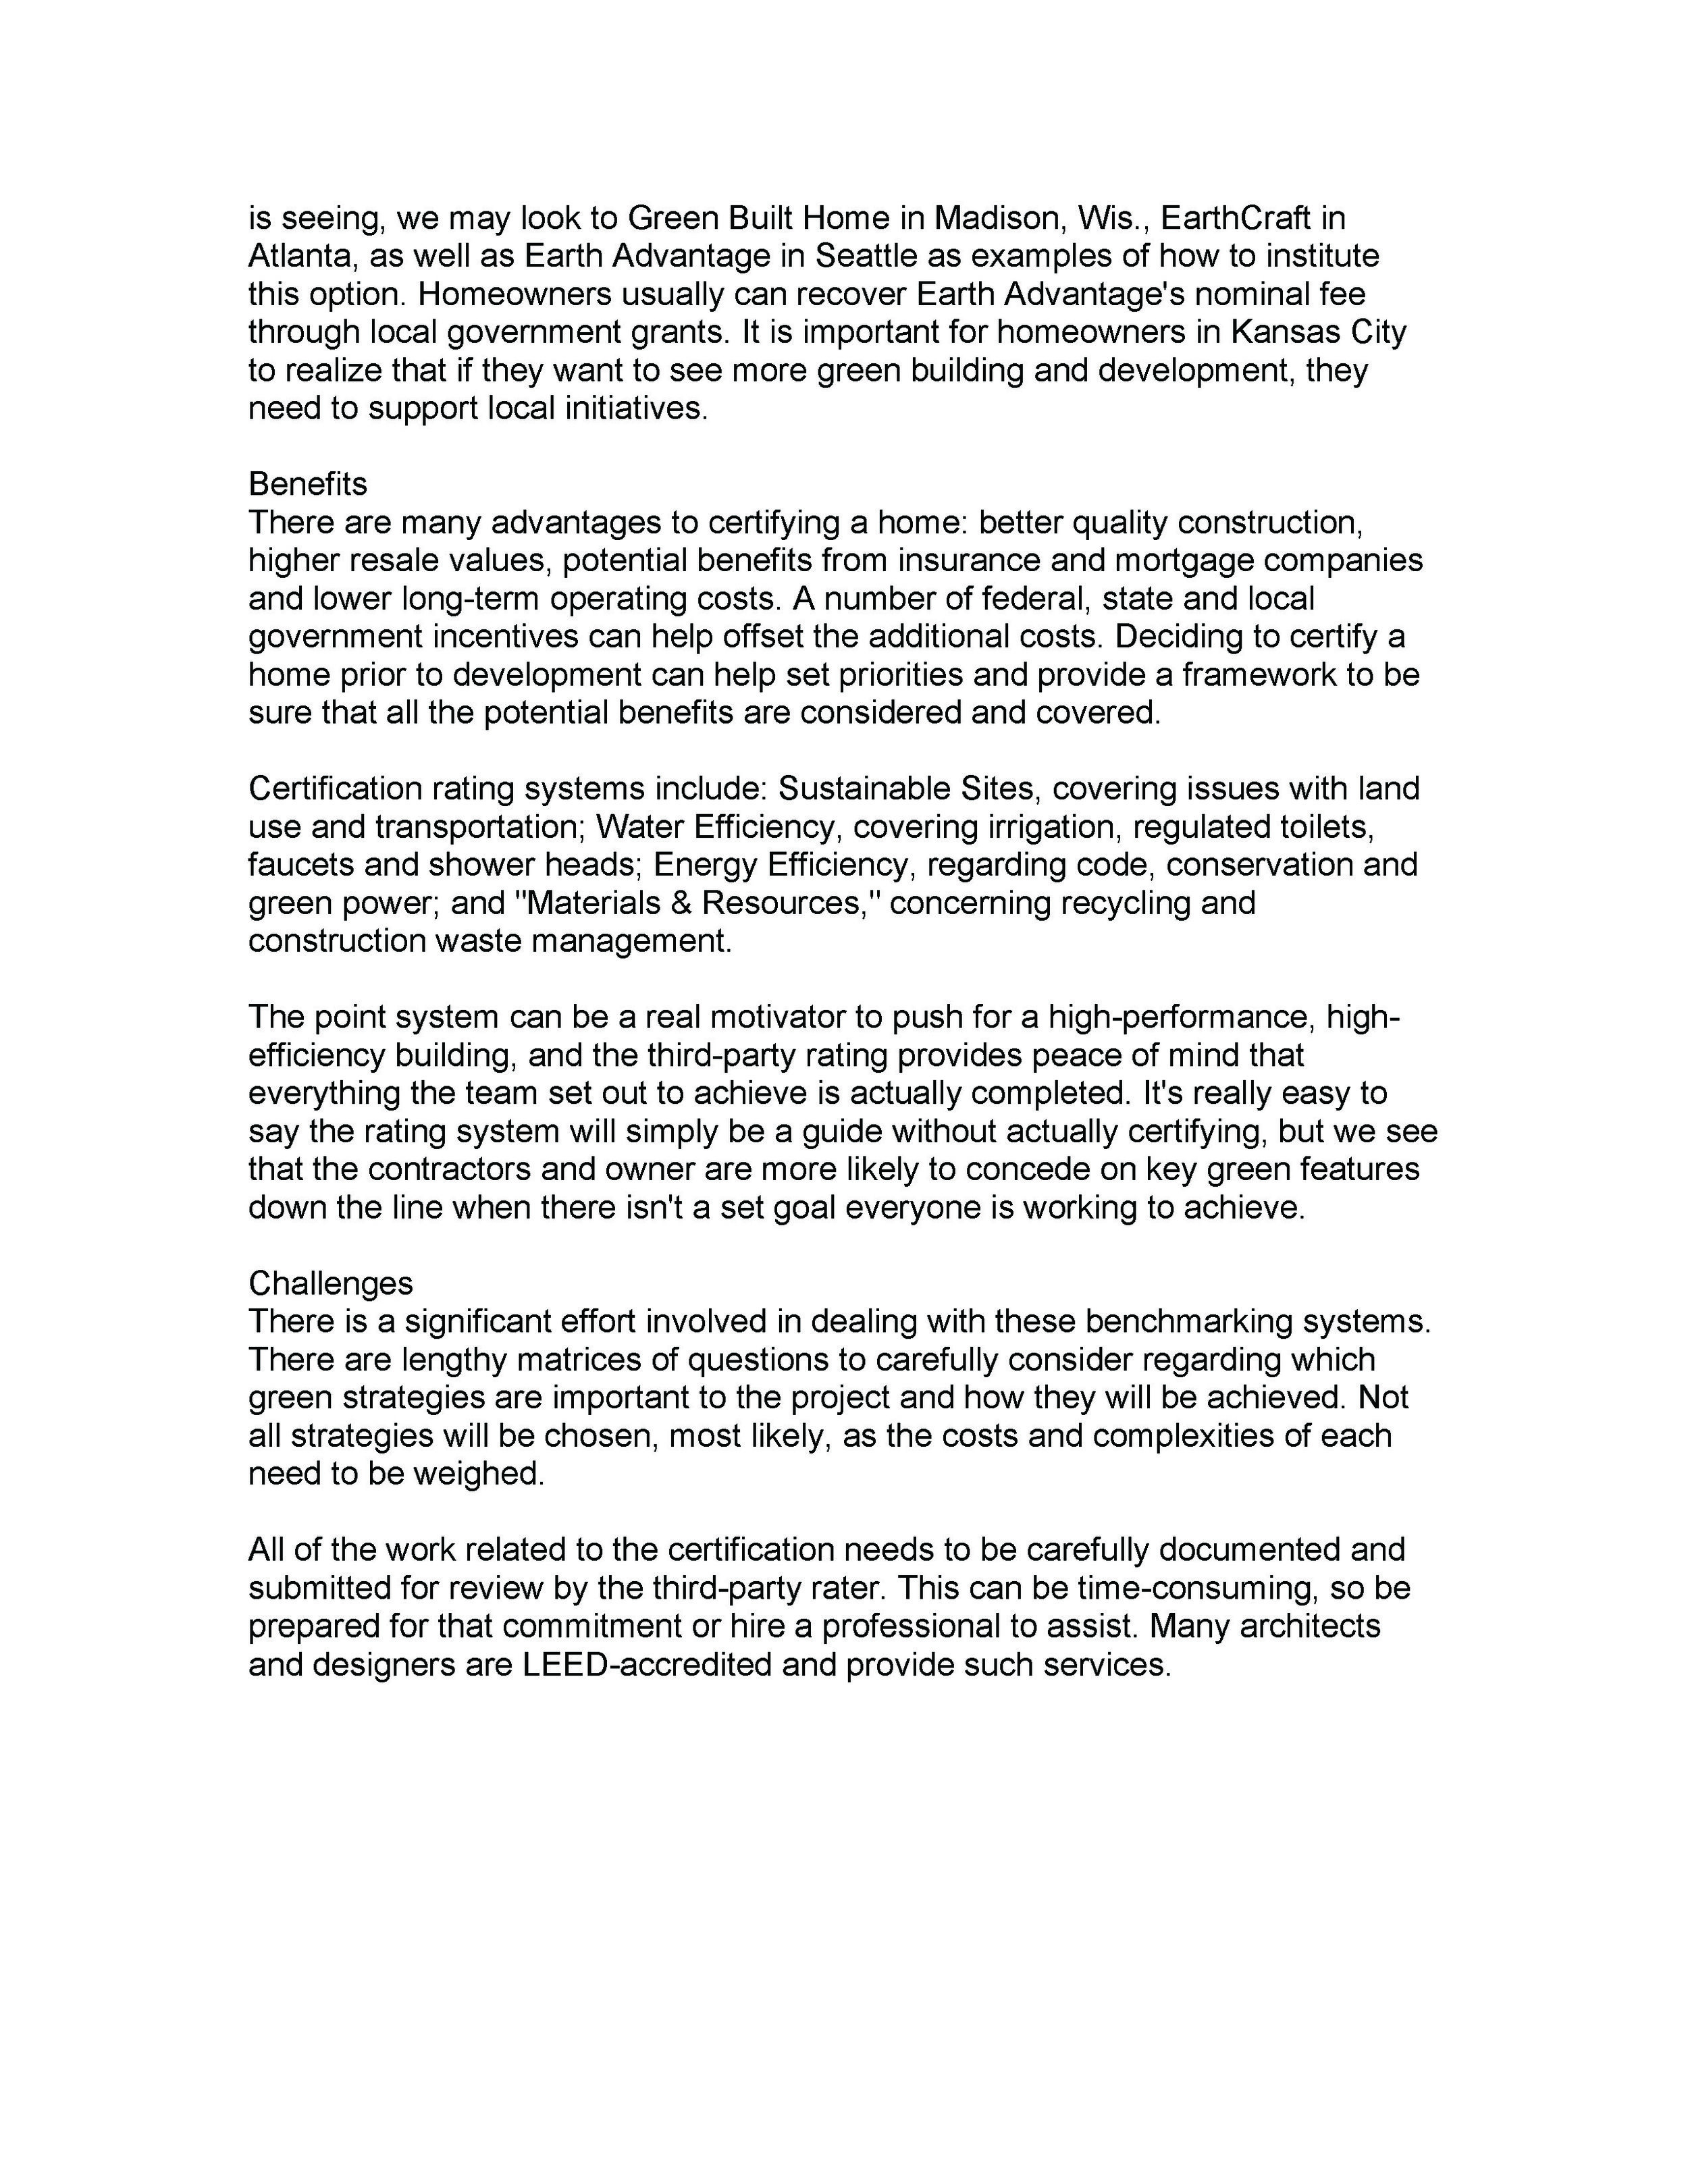 KCStar_2012_GreenCertification_DominiqueDavison_Page_2.jpg